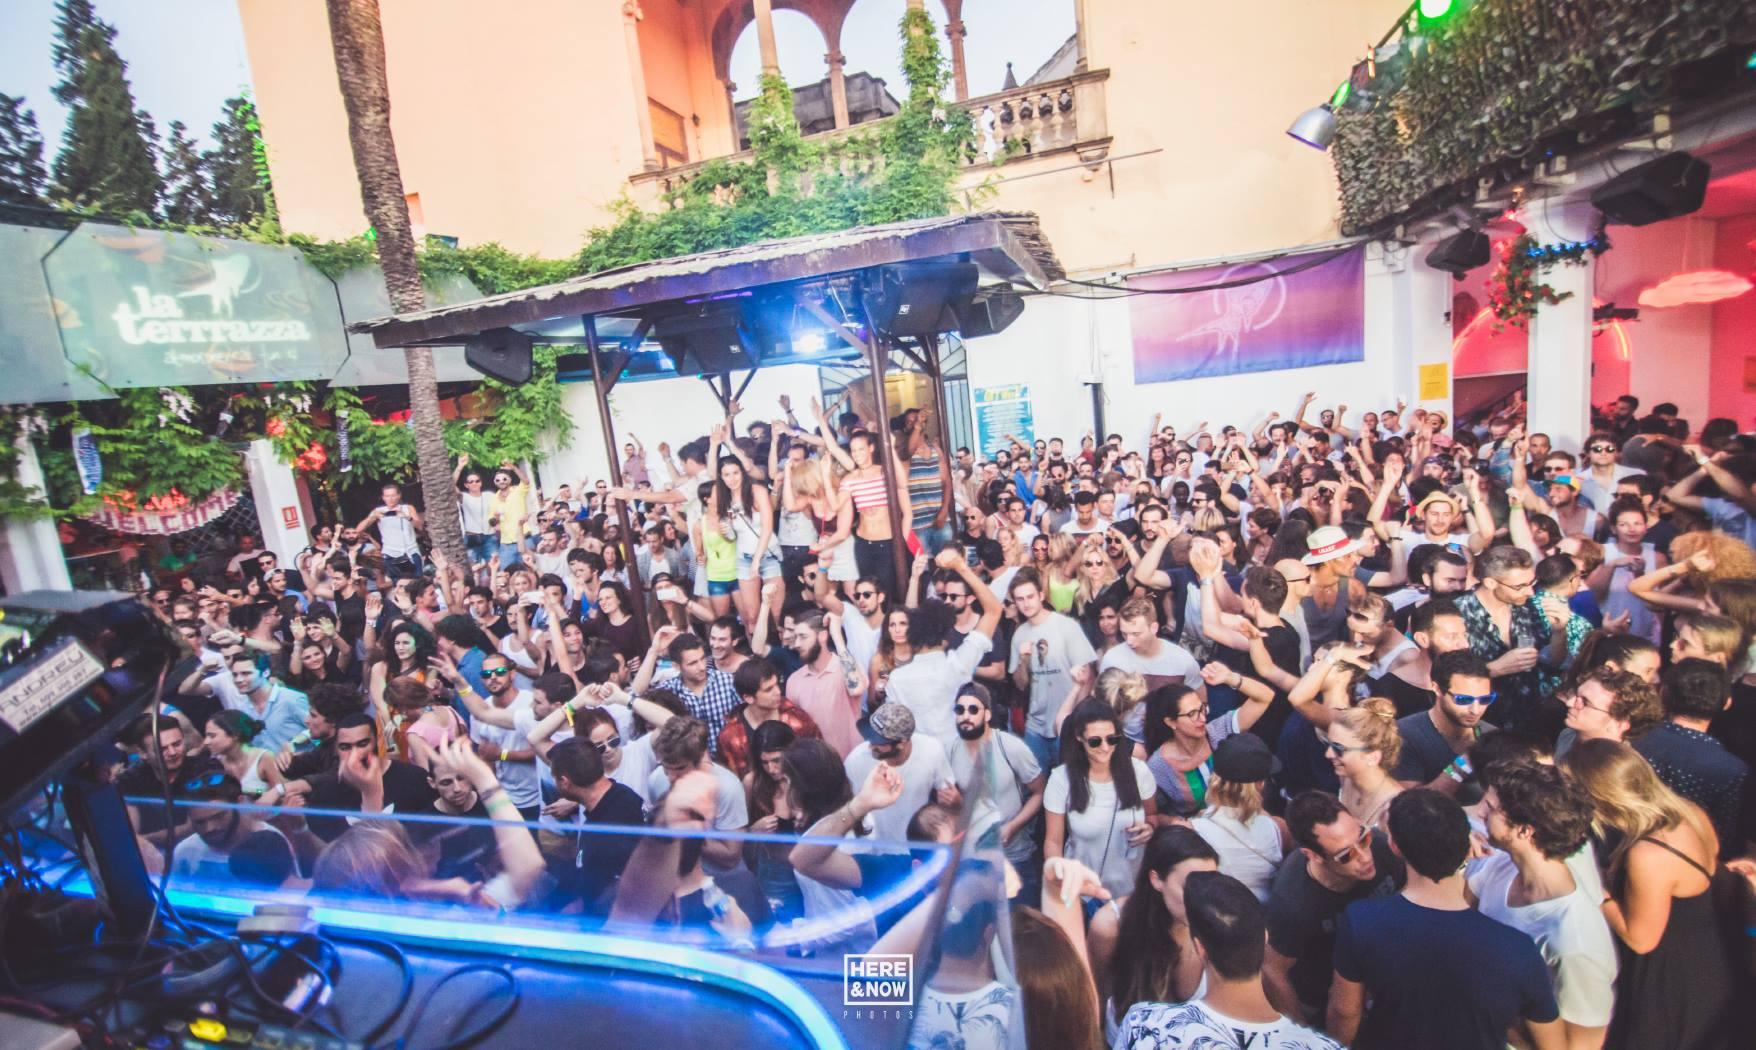 La Terrrazza Barcelona Atmospherical Fun Club Events